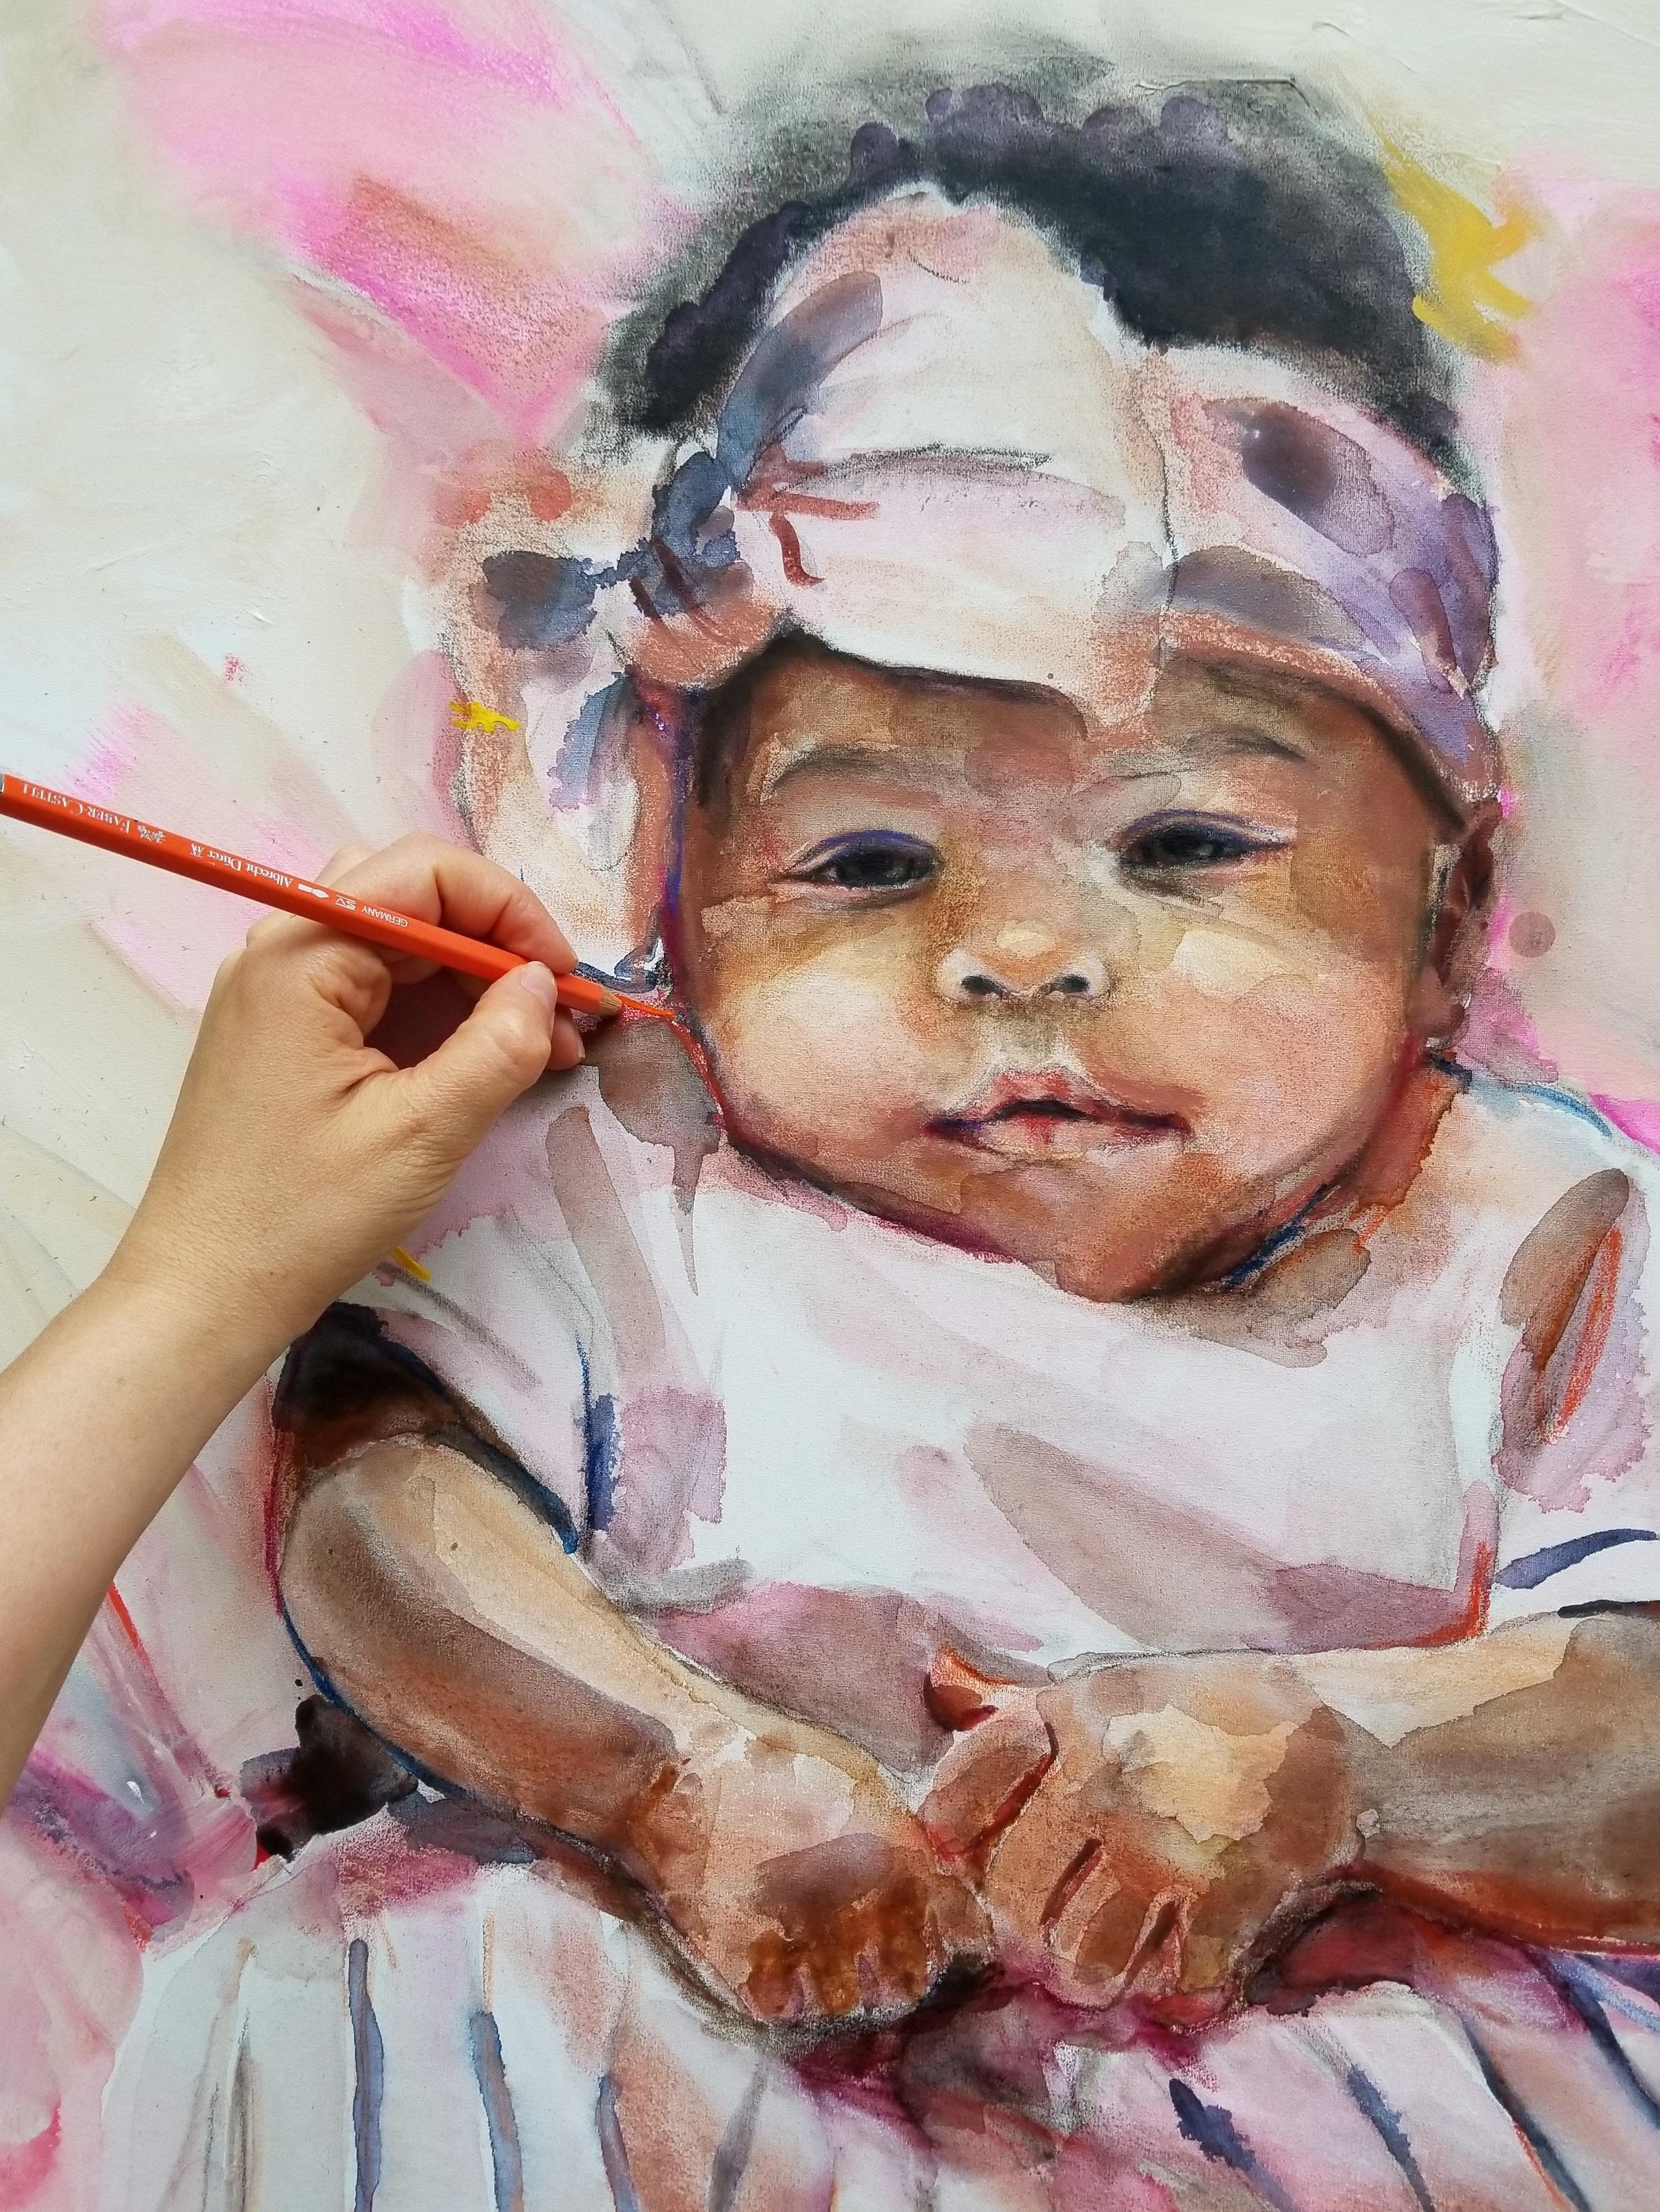 Baby Portrait In Process